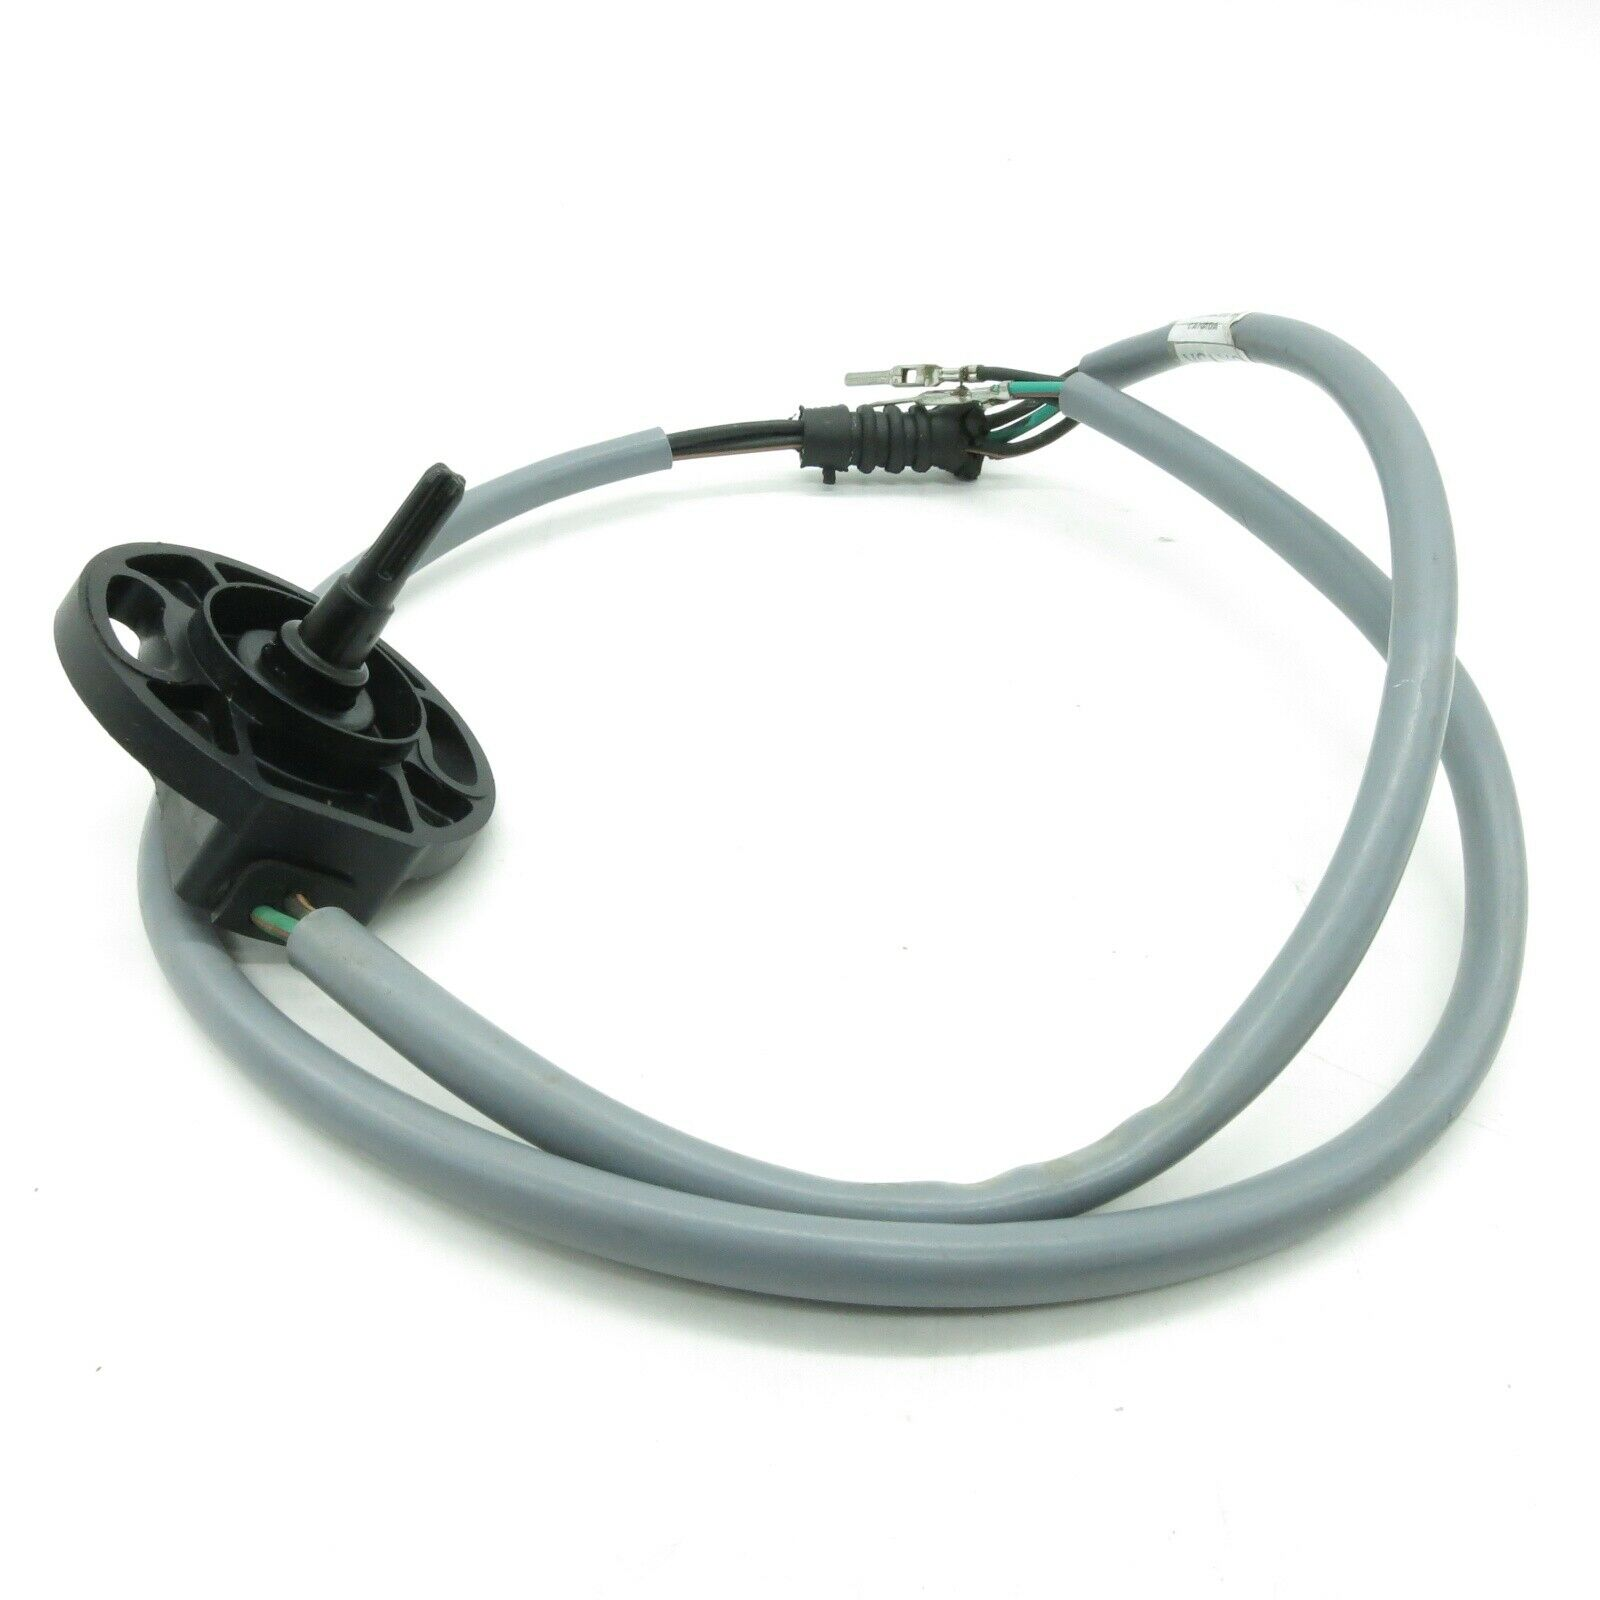 Trimmsender Trim sender Potentiometer für Volvo Penta TSK SX DP-S DP-SM Antrieb